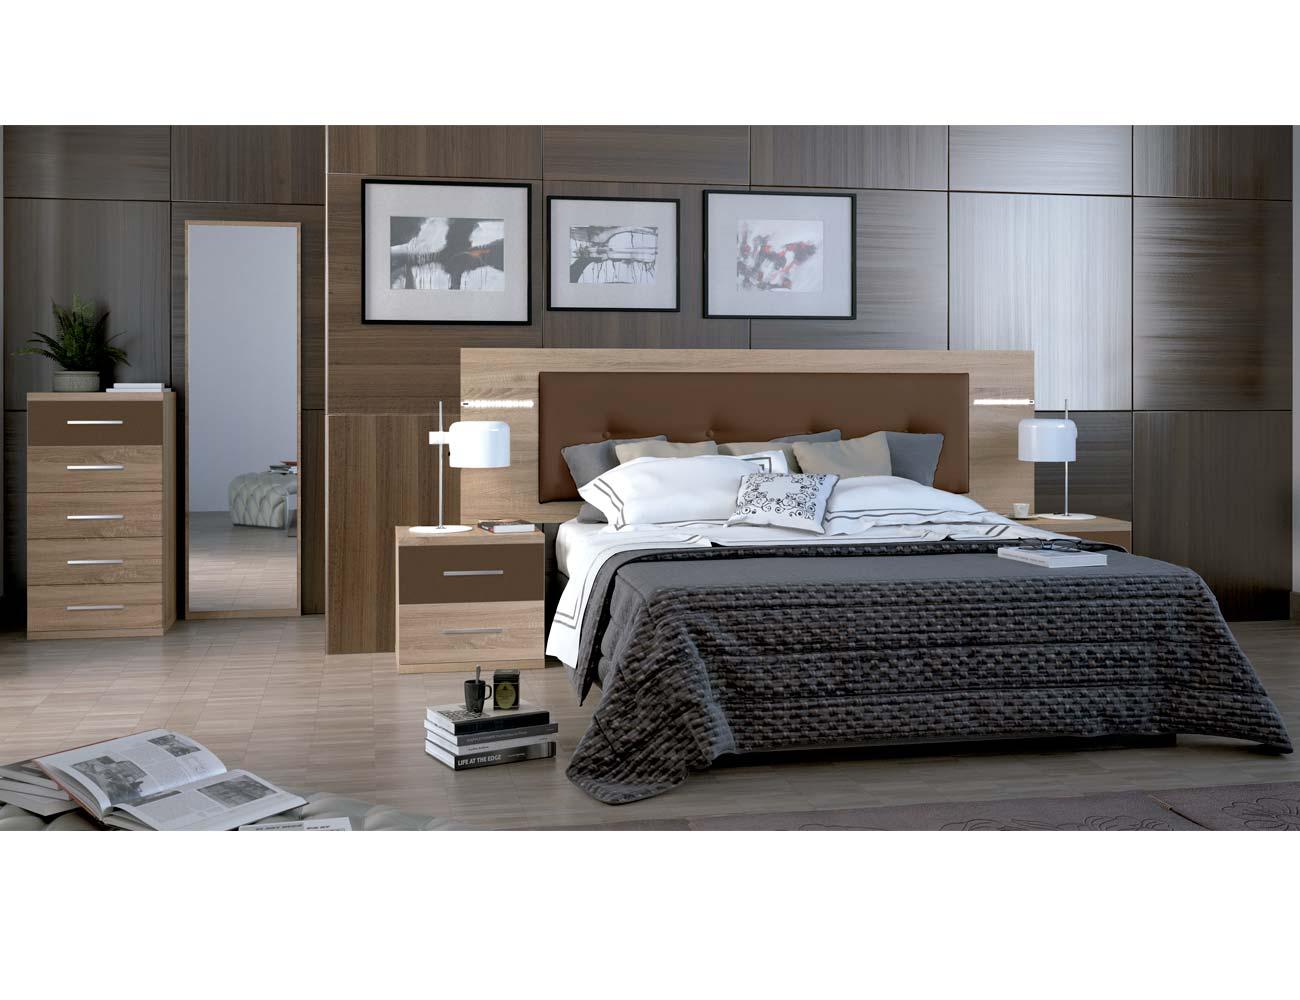 Dormitorio matrimonio moderno 16 cambrian chocolate